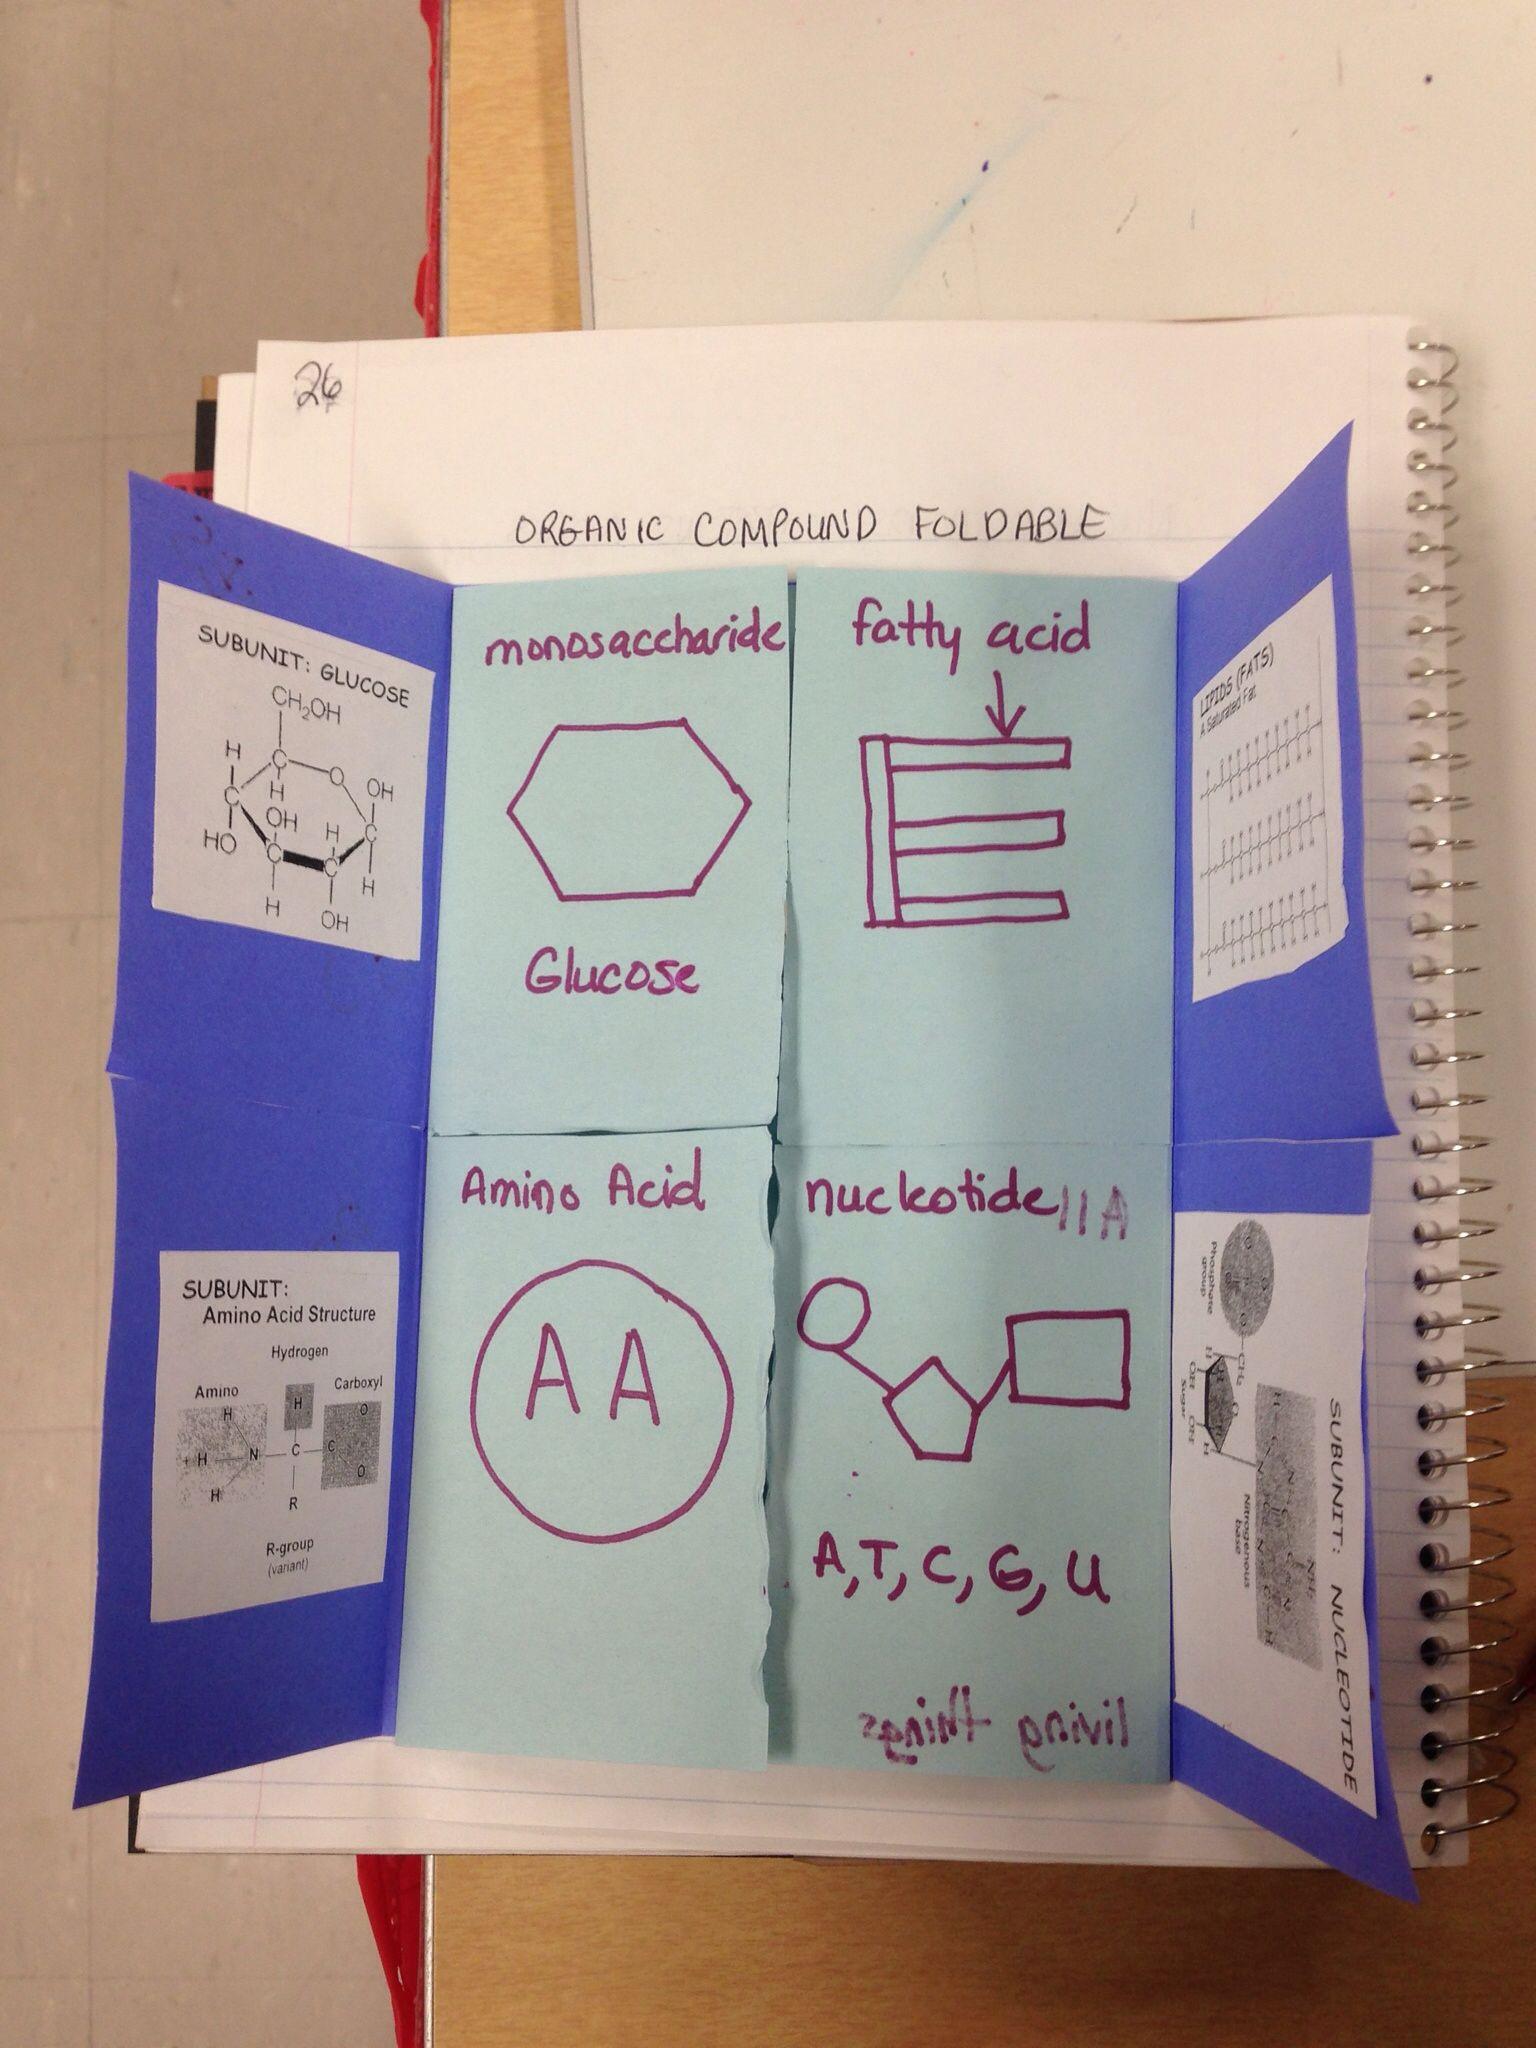 Organic Compounds Foldable Foldable